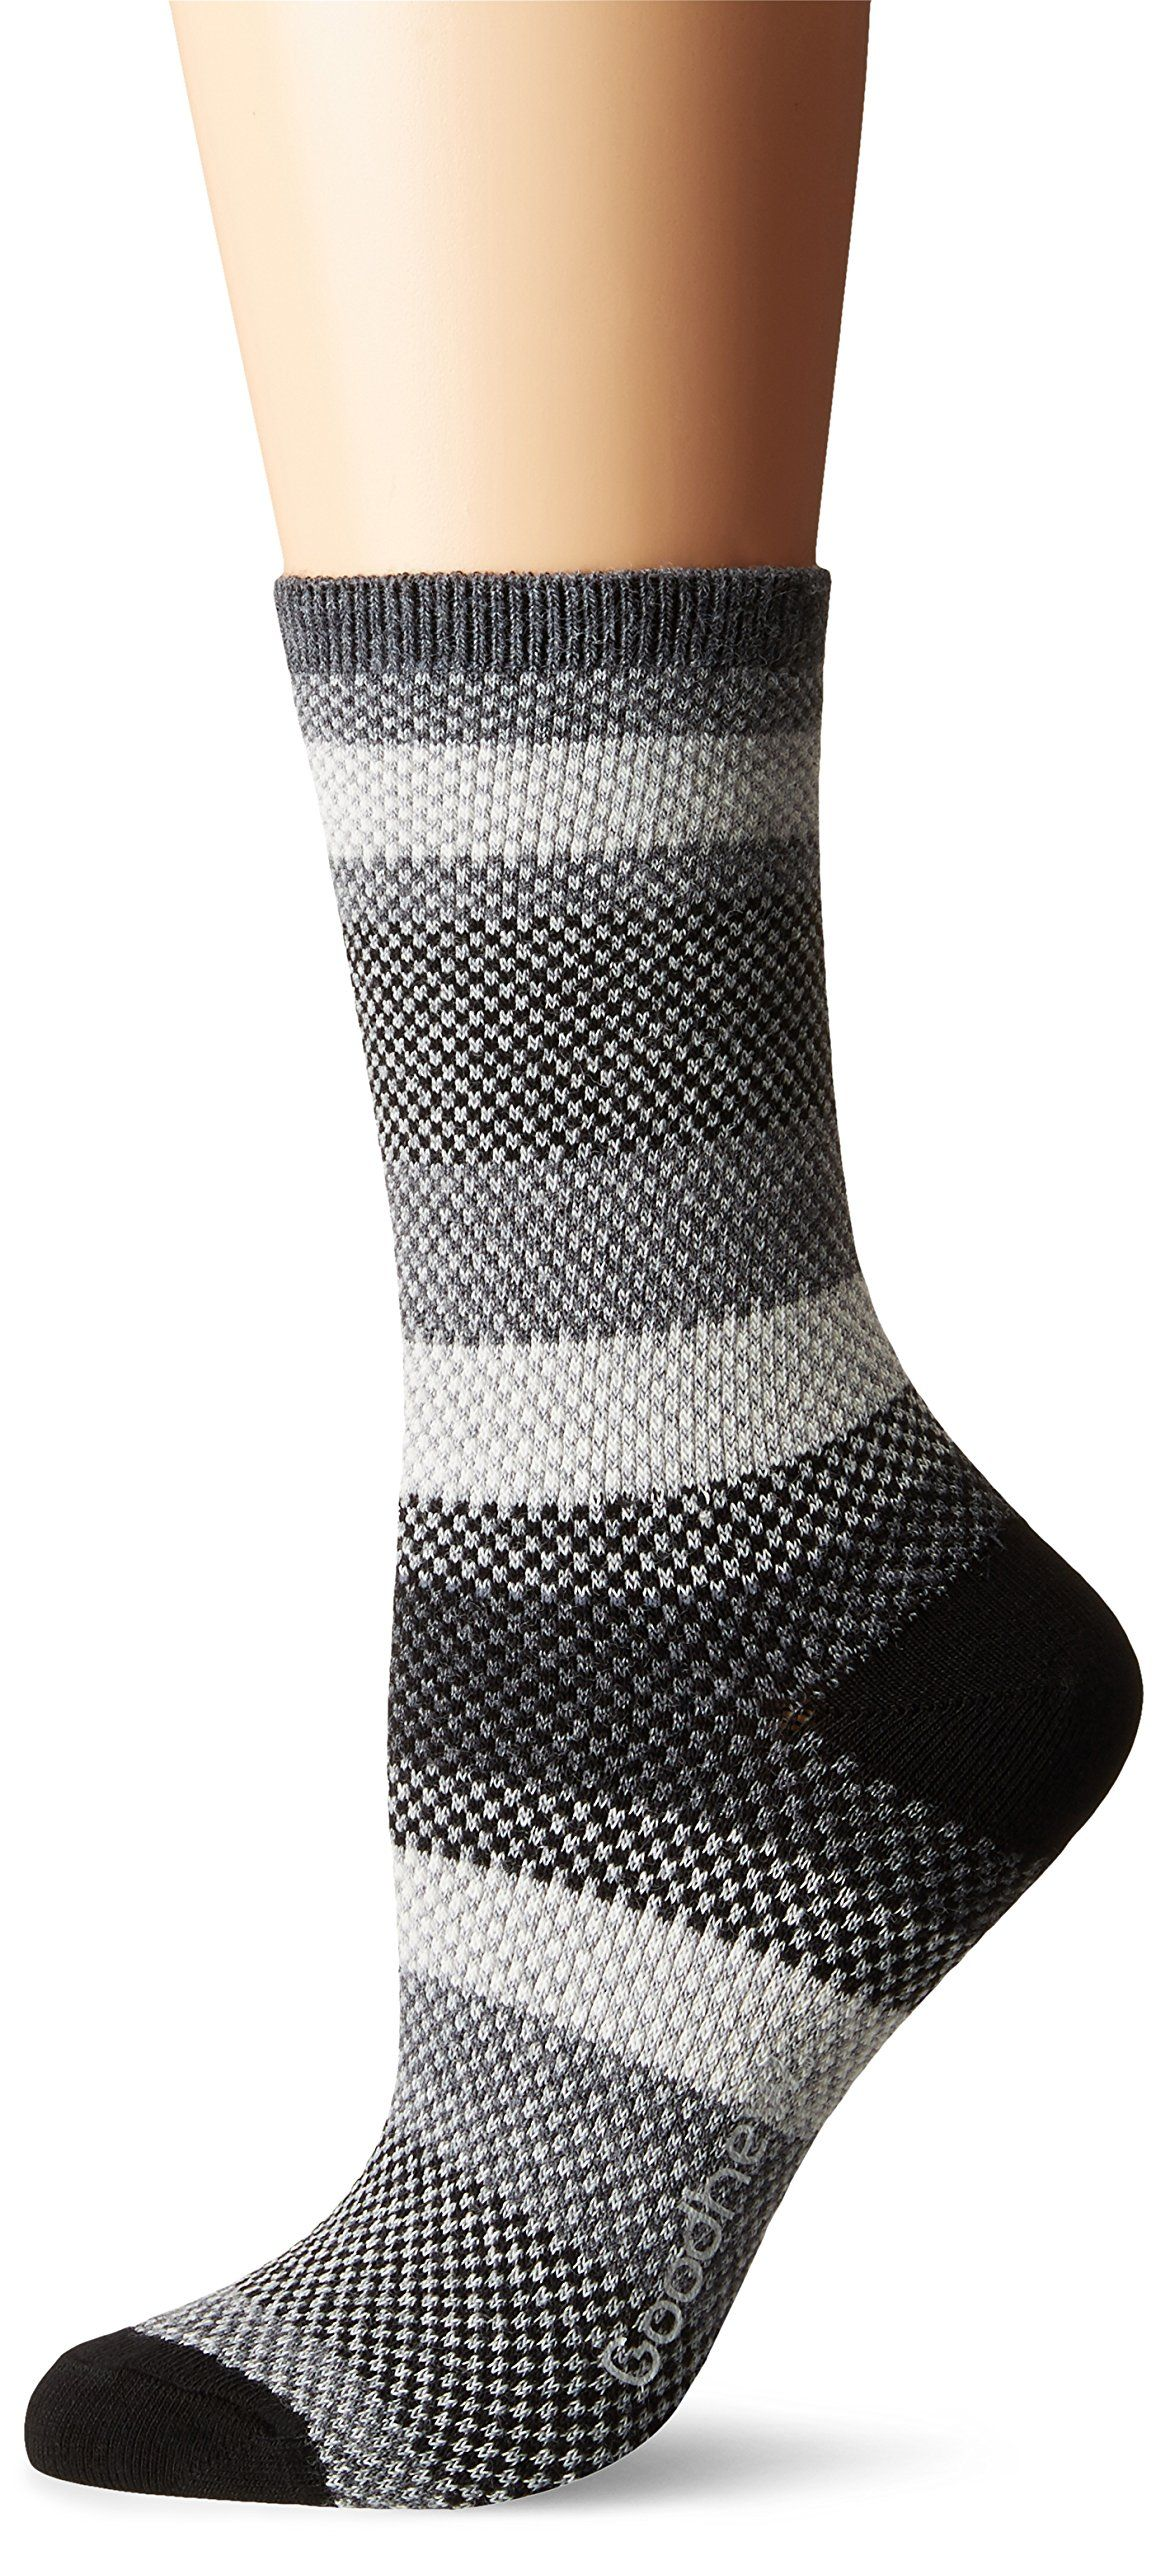 Sockwell Womens Mixology Crew Socks